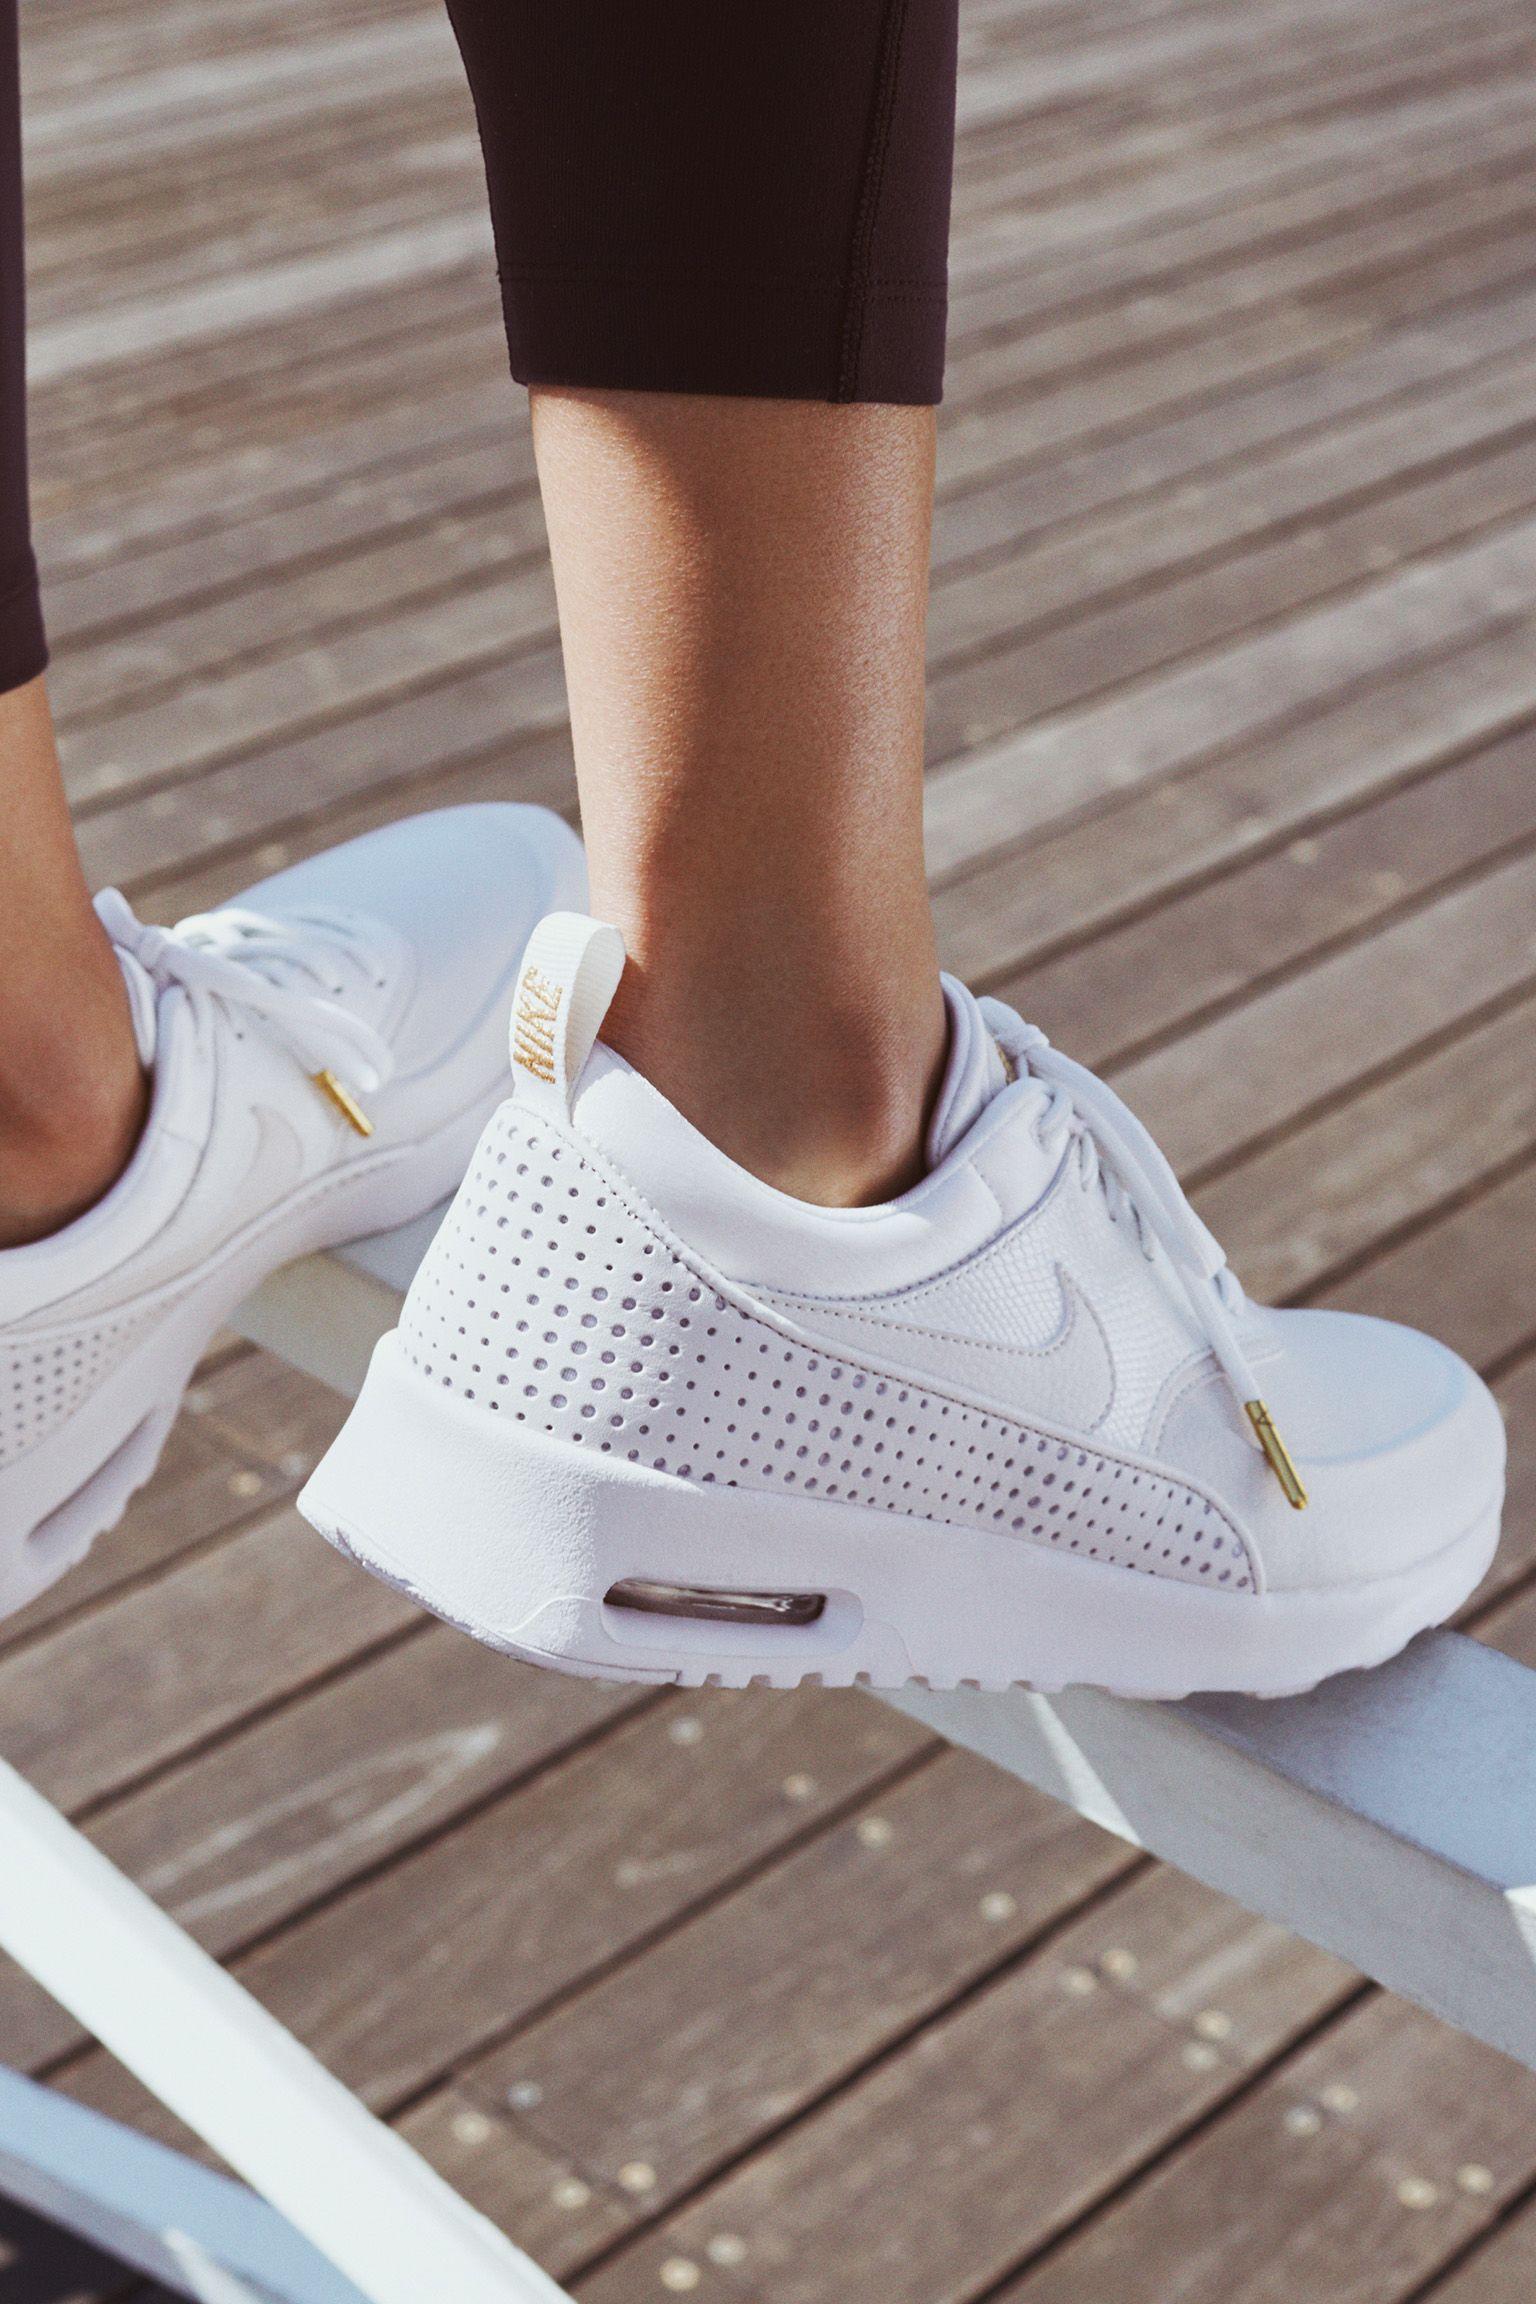 Nike Air Max Thea SE Premium